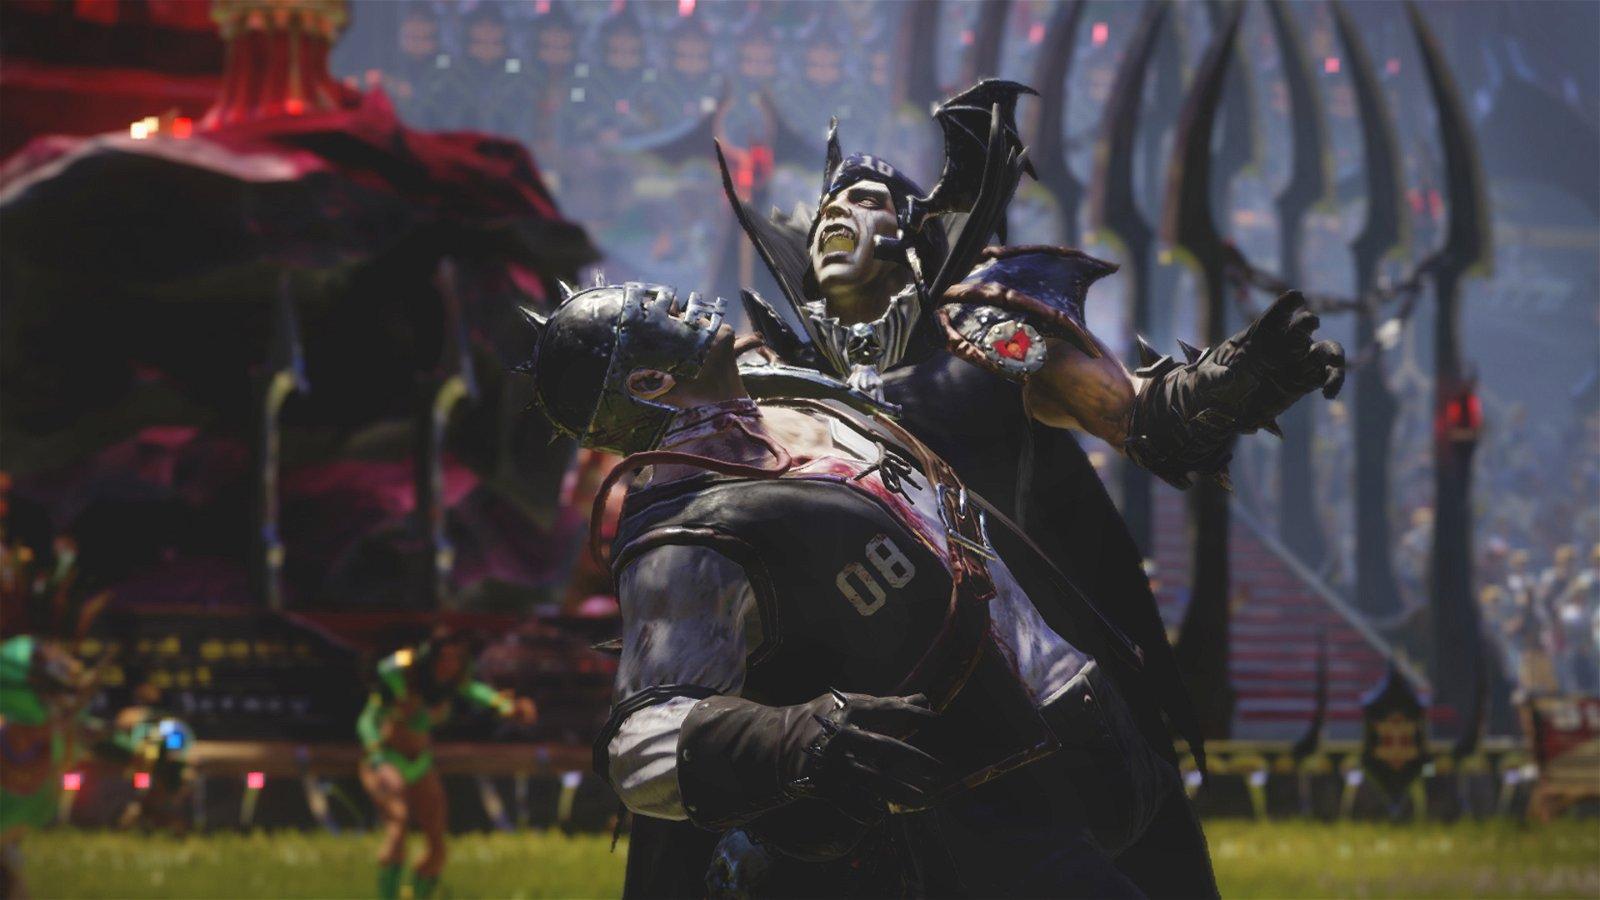 Blood Bowl 2 - Legendary Edition (Pc) Review: A Gridiron Goblin 3